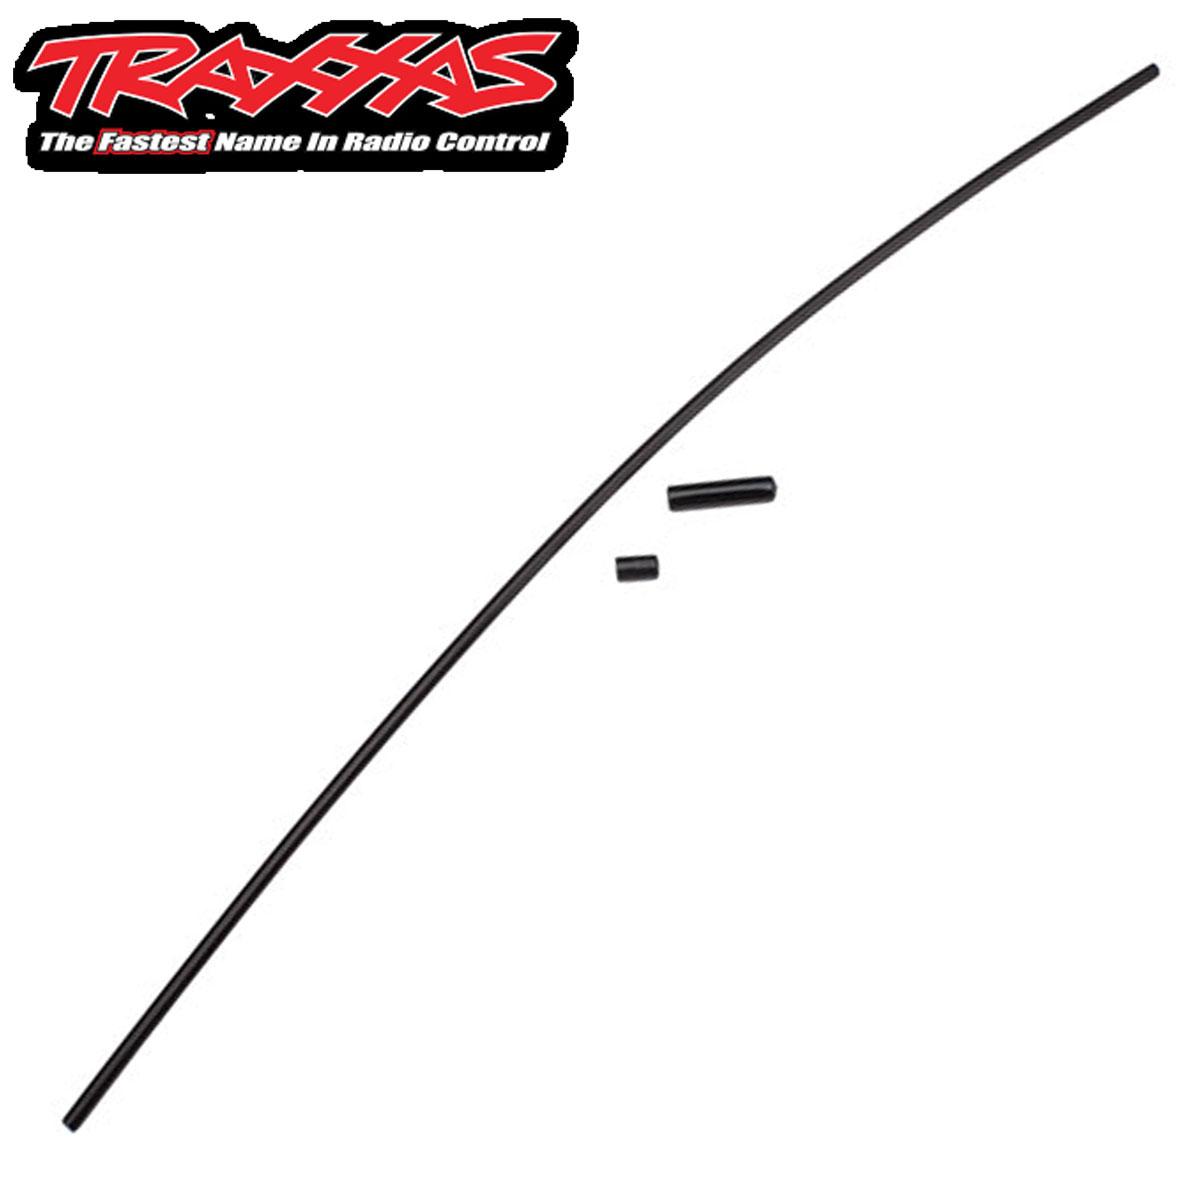 New Traxxas Slash 4X4 Ultimate Antenna Tube Black (1